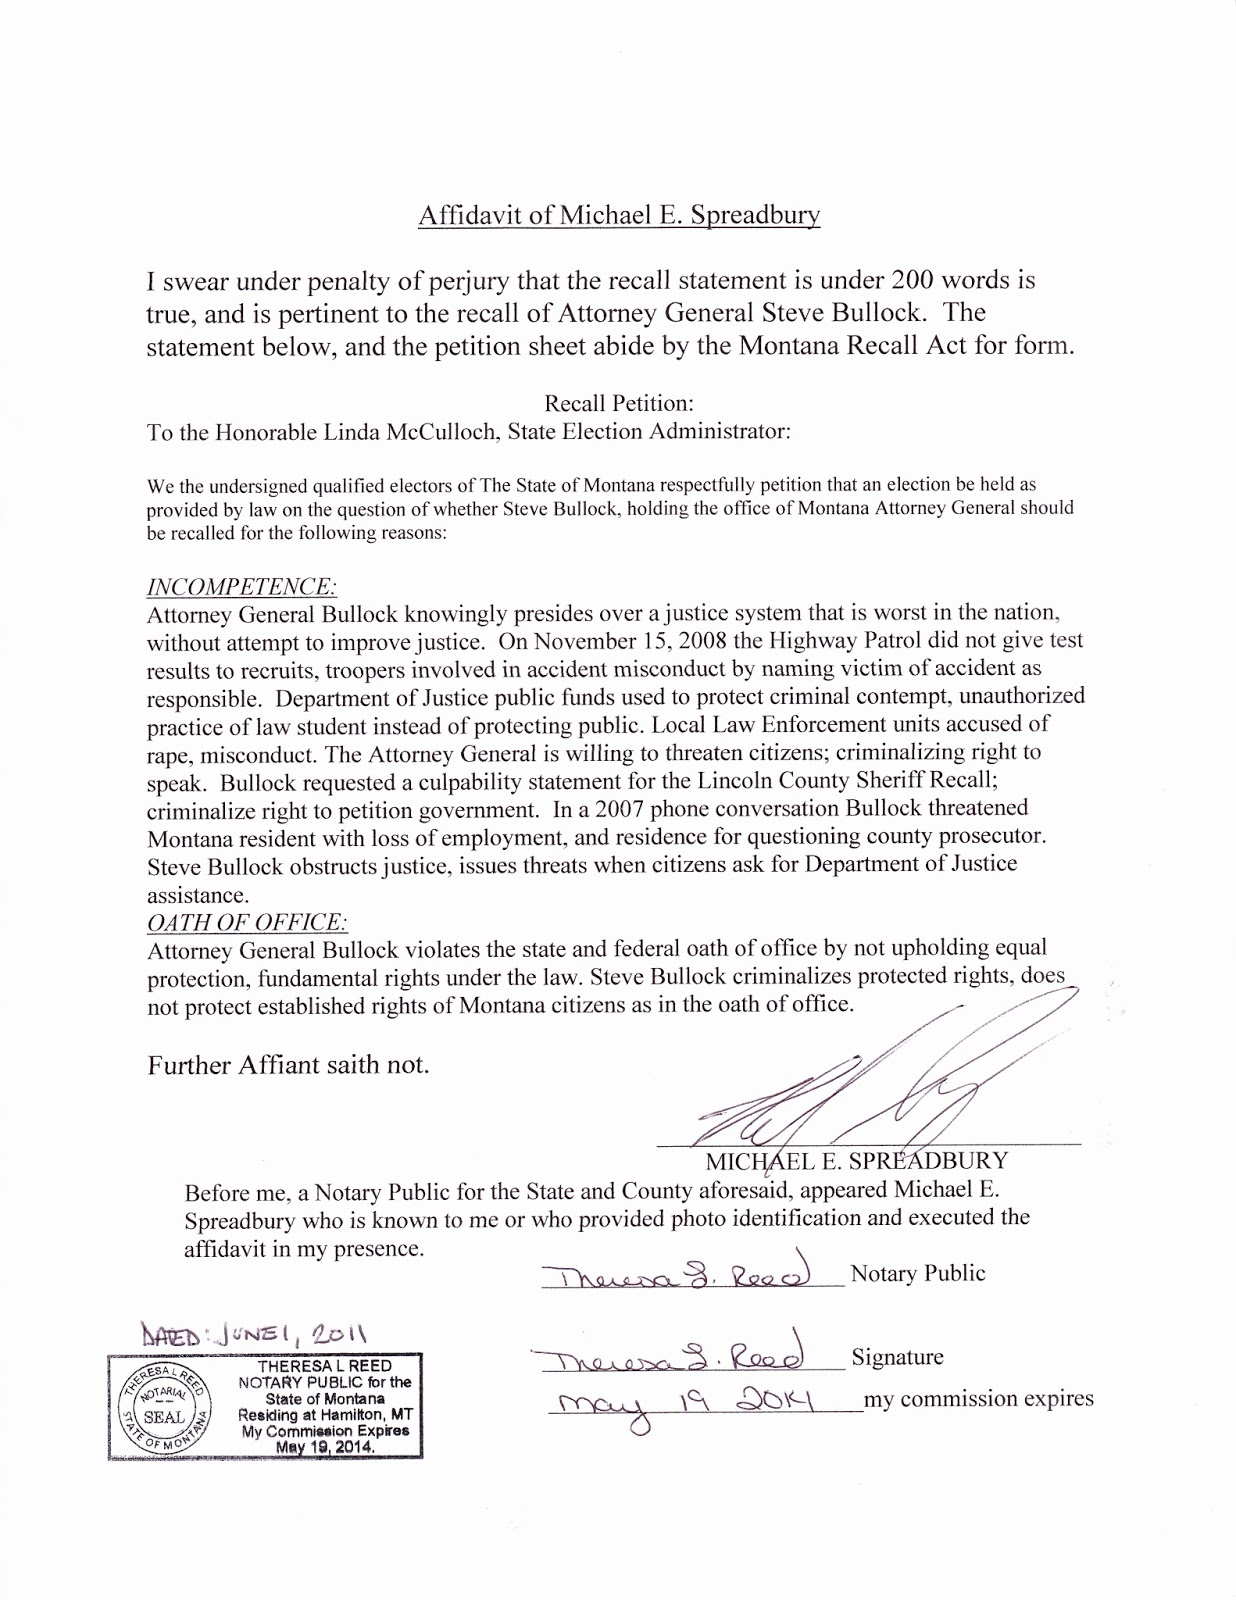 Bullock Affidavit Stevebullockmtblogspotcom How To Write An Affidavit Uk How  To Write An Affidavit Uk  How To Write An Affidavit Uk